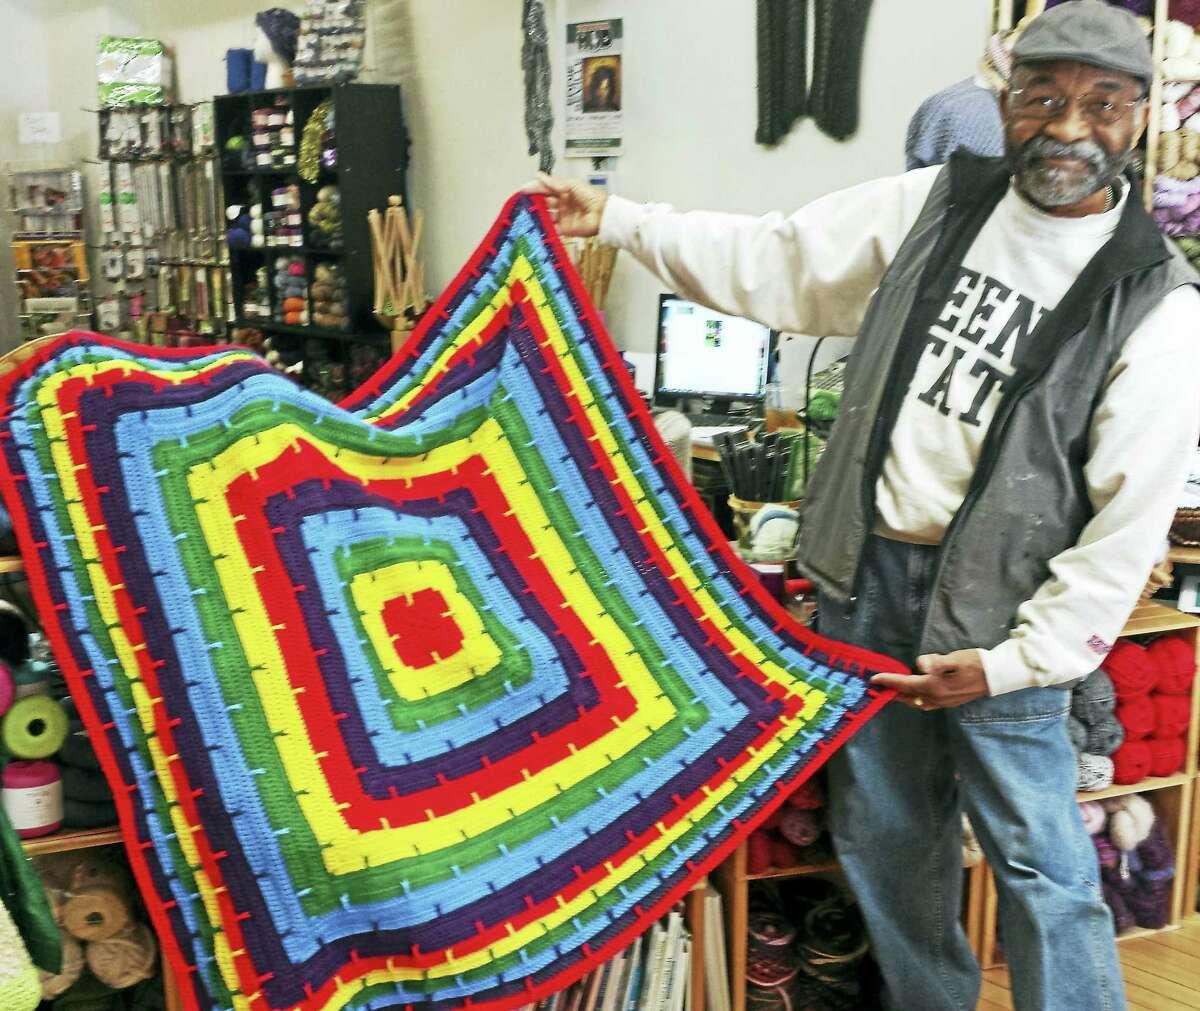 Photo by Ginger BalchJoe Harris, an avid crocheter, shows his latest creation.